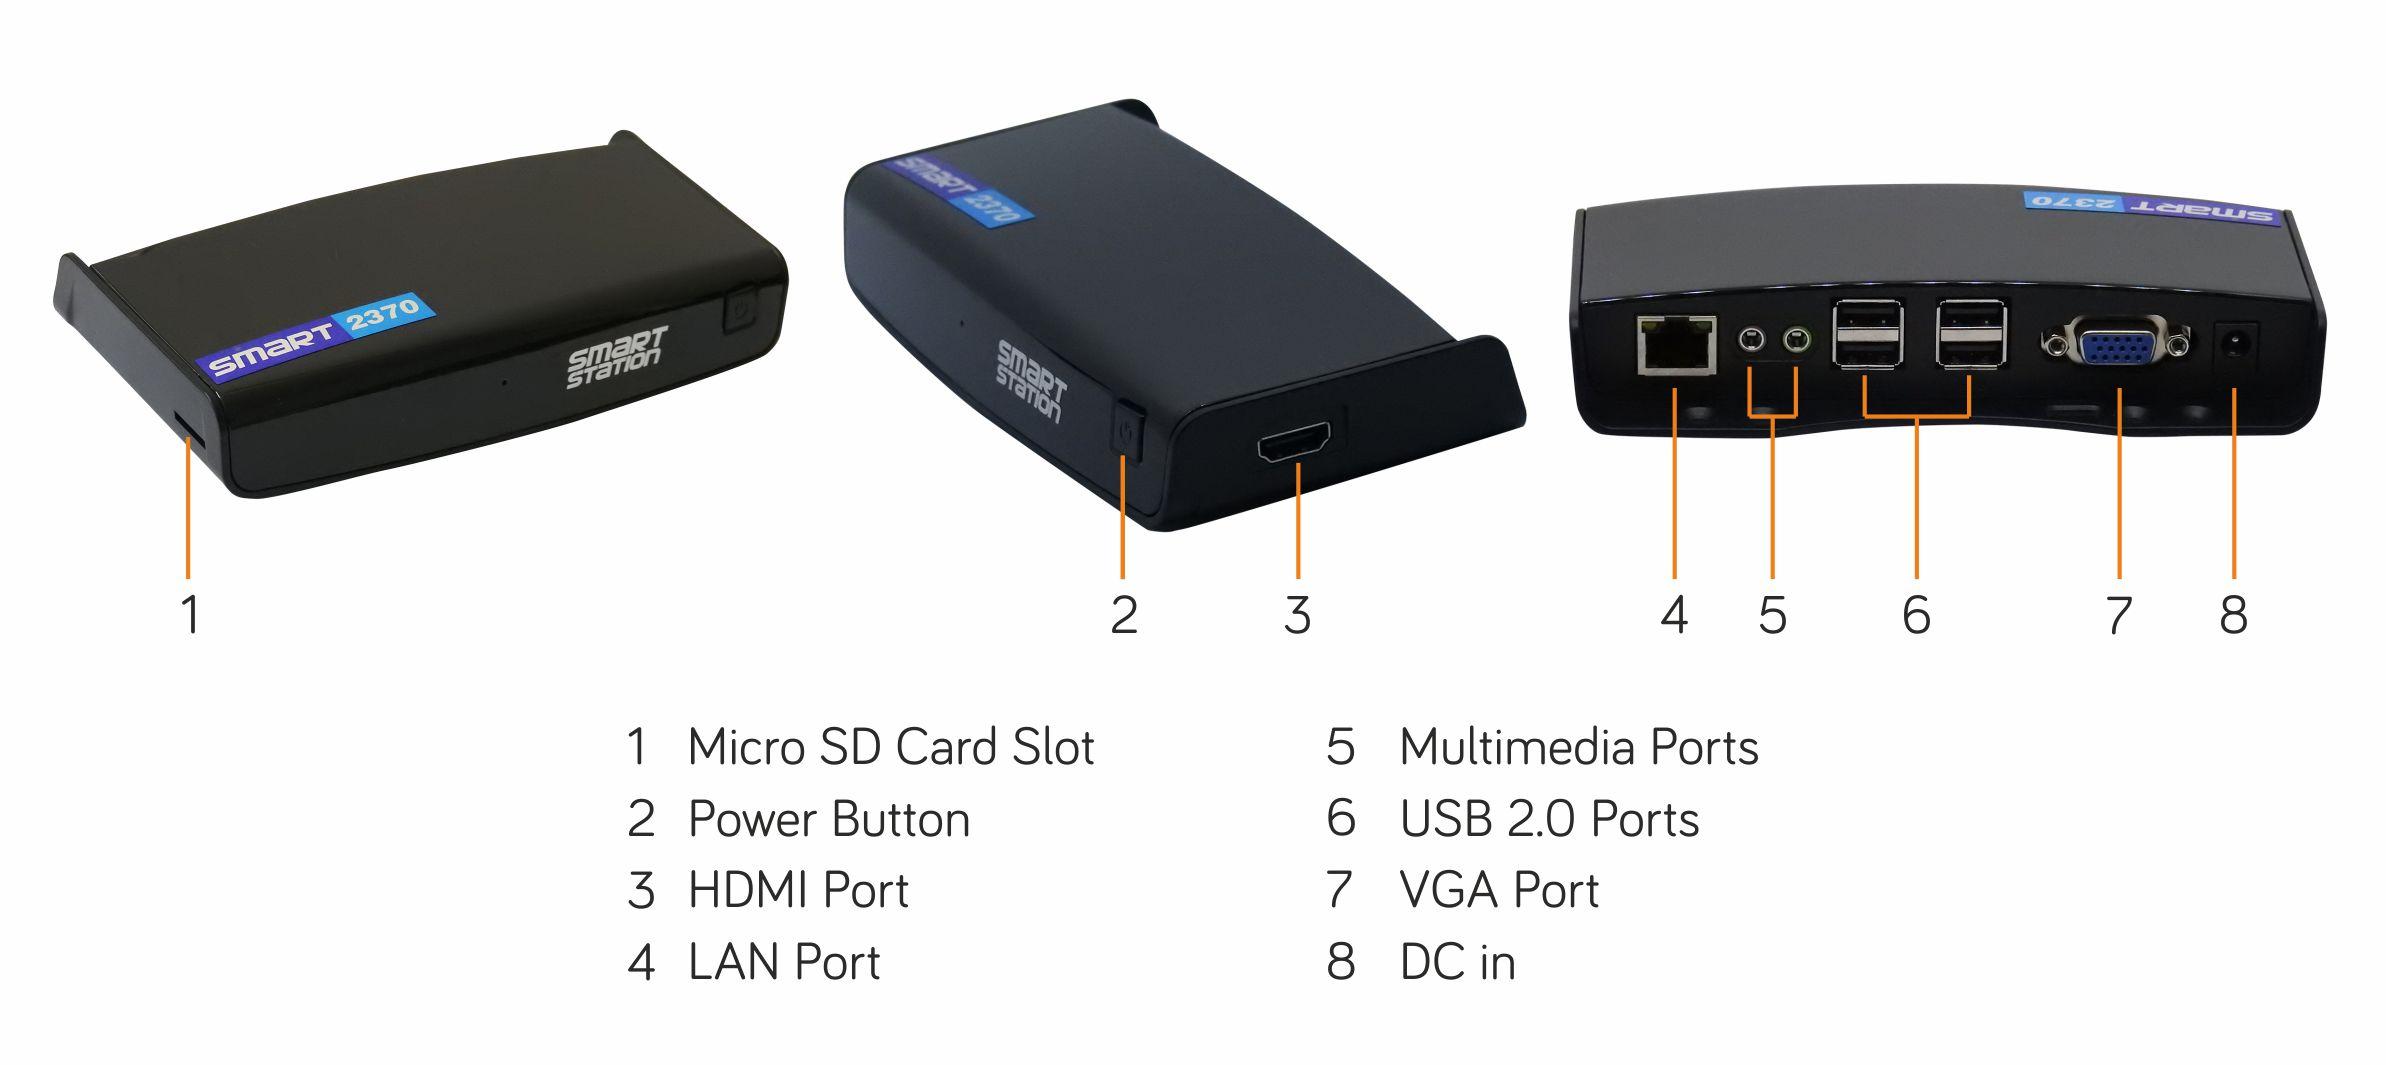 Smart 2370 connectivity